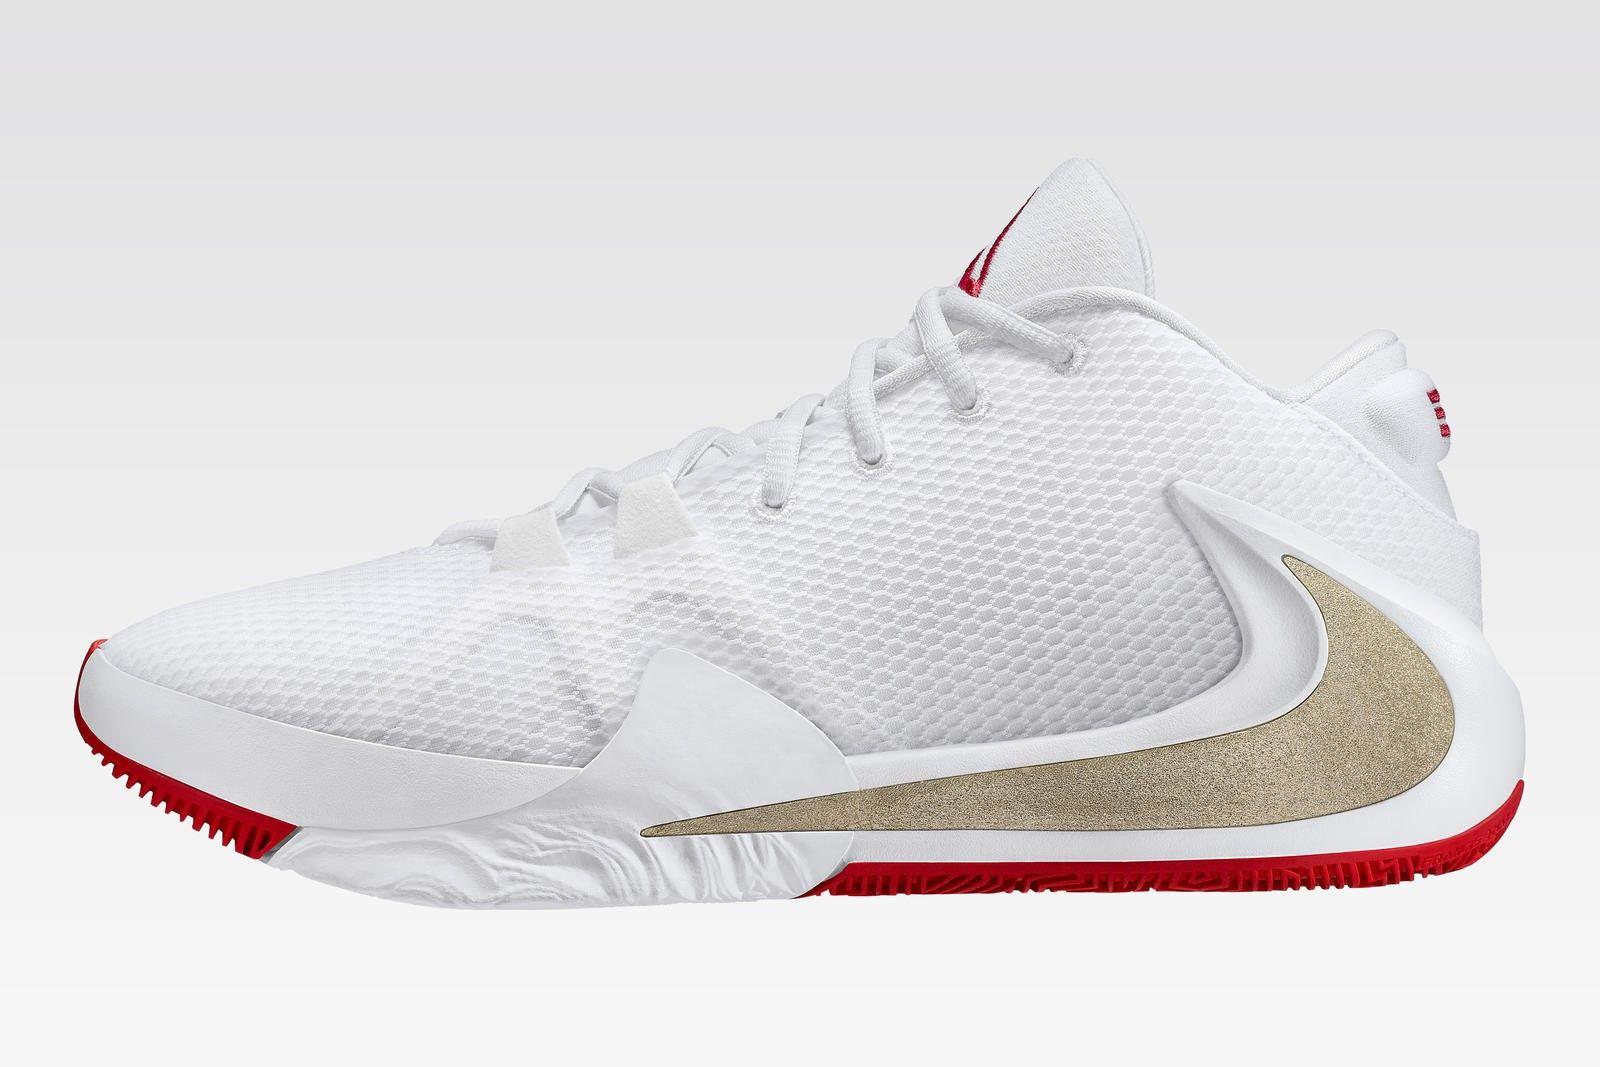 Nike Zoom Freak 1 Atmosphere Grey White